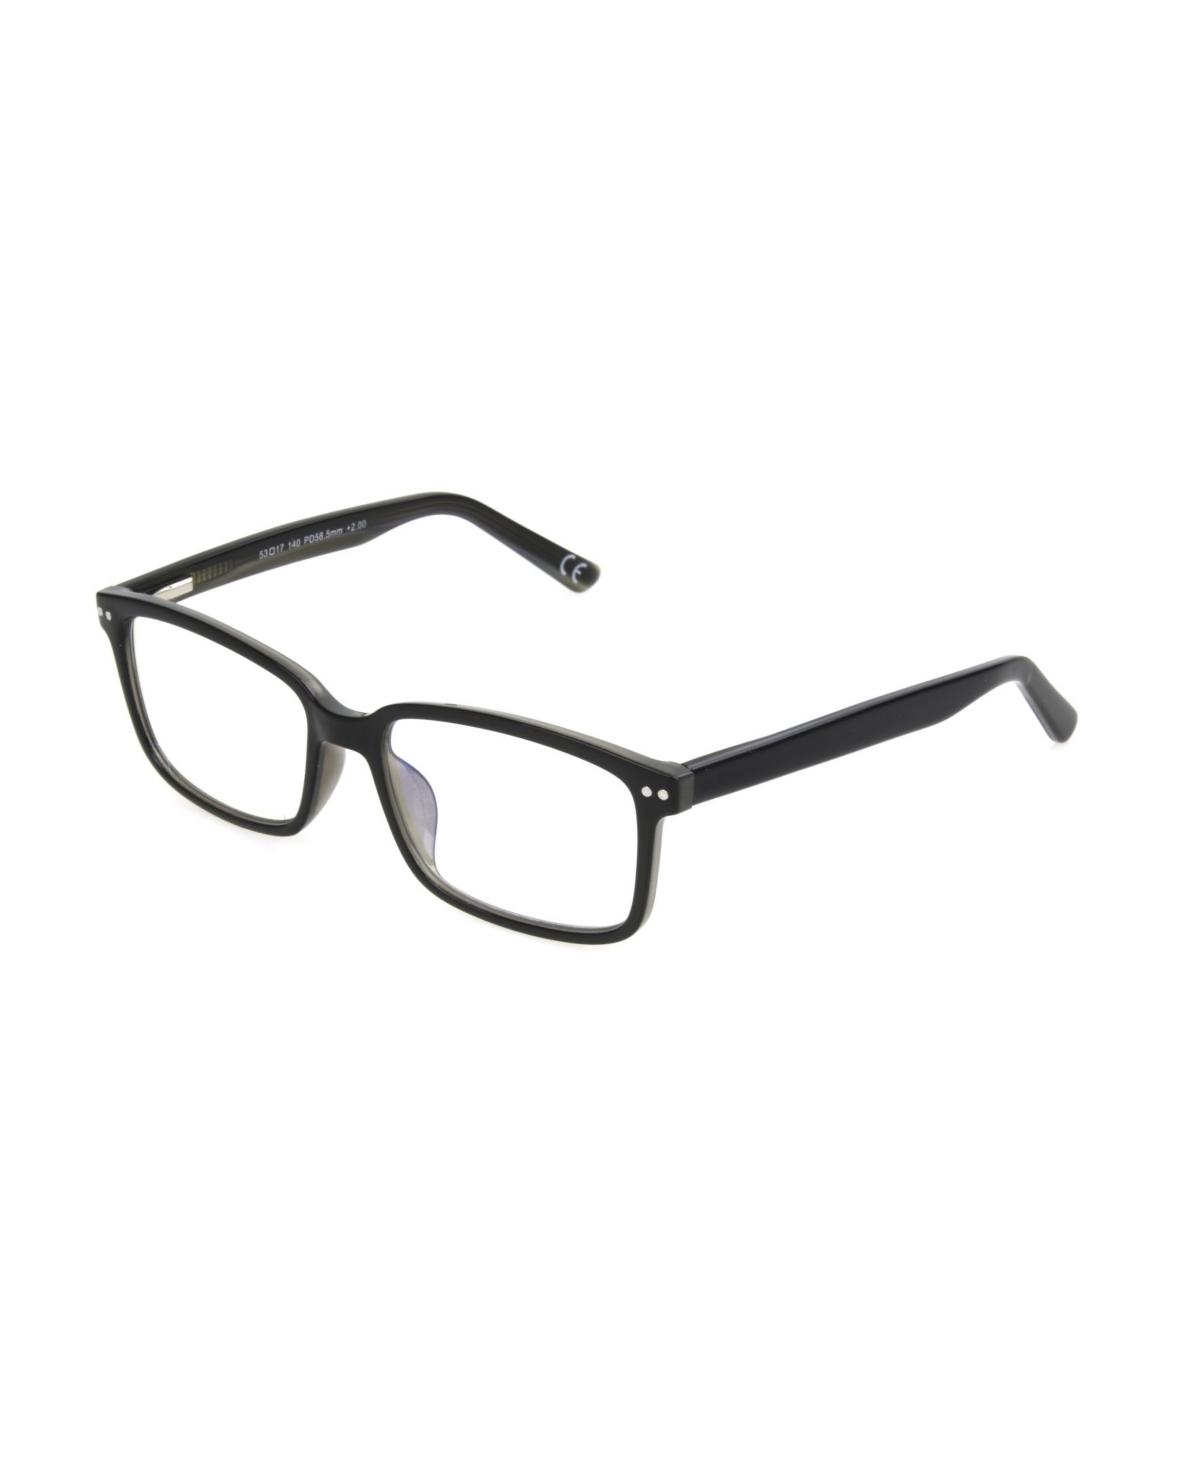 Foster Grant Zack R Men's Rectangle Reading Glasses